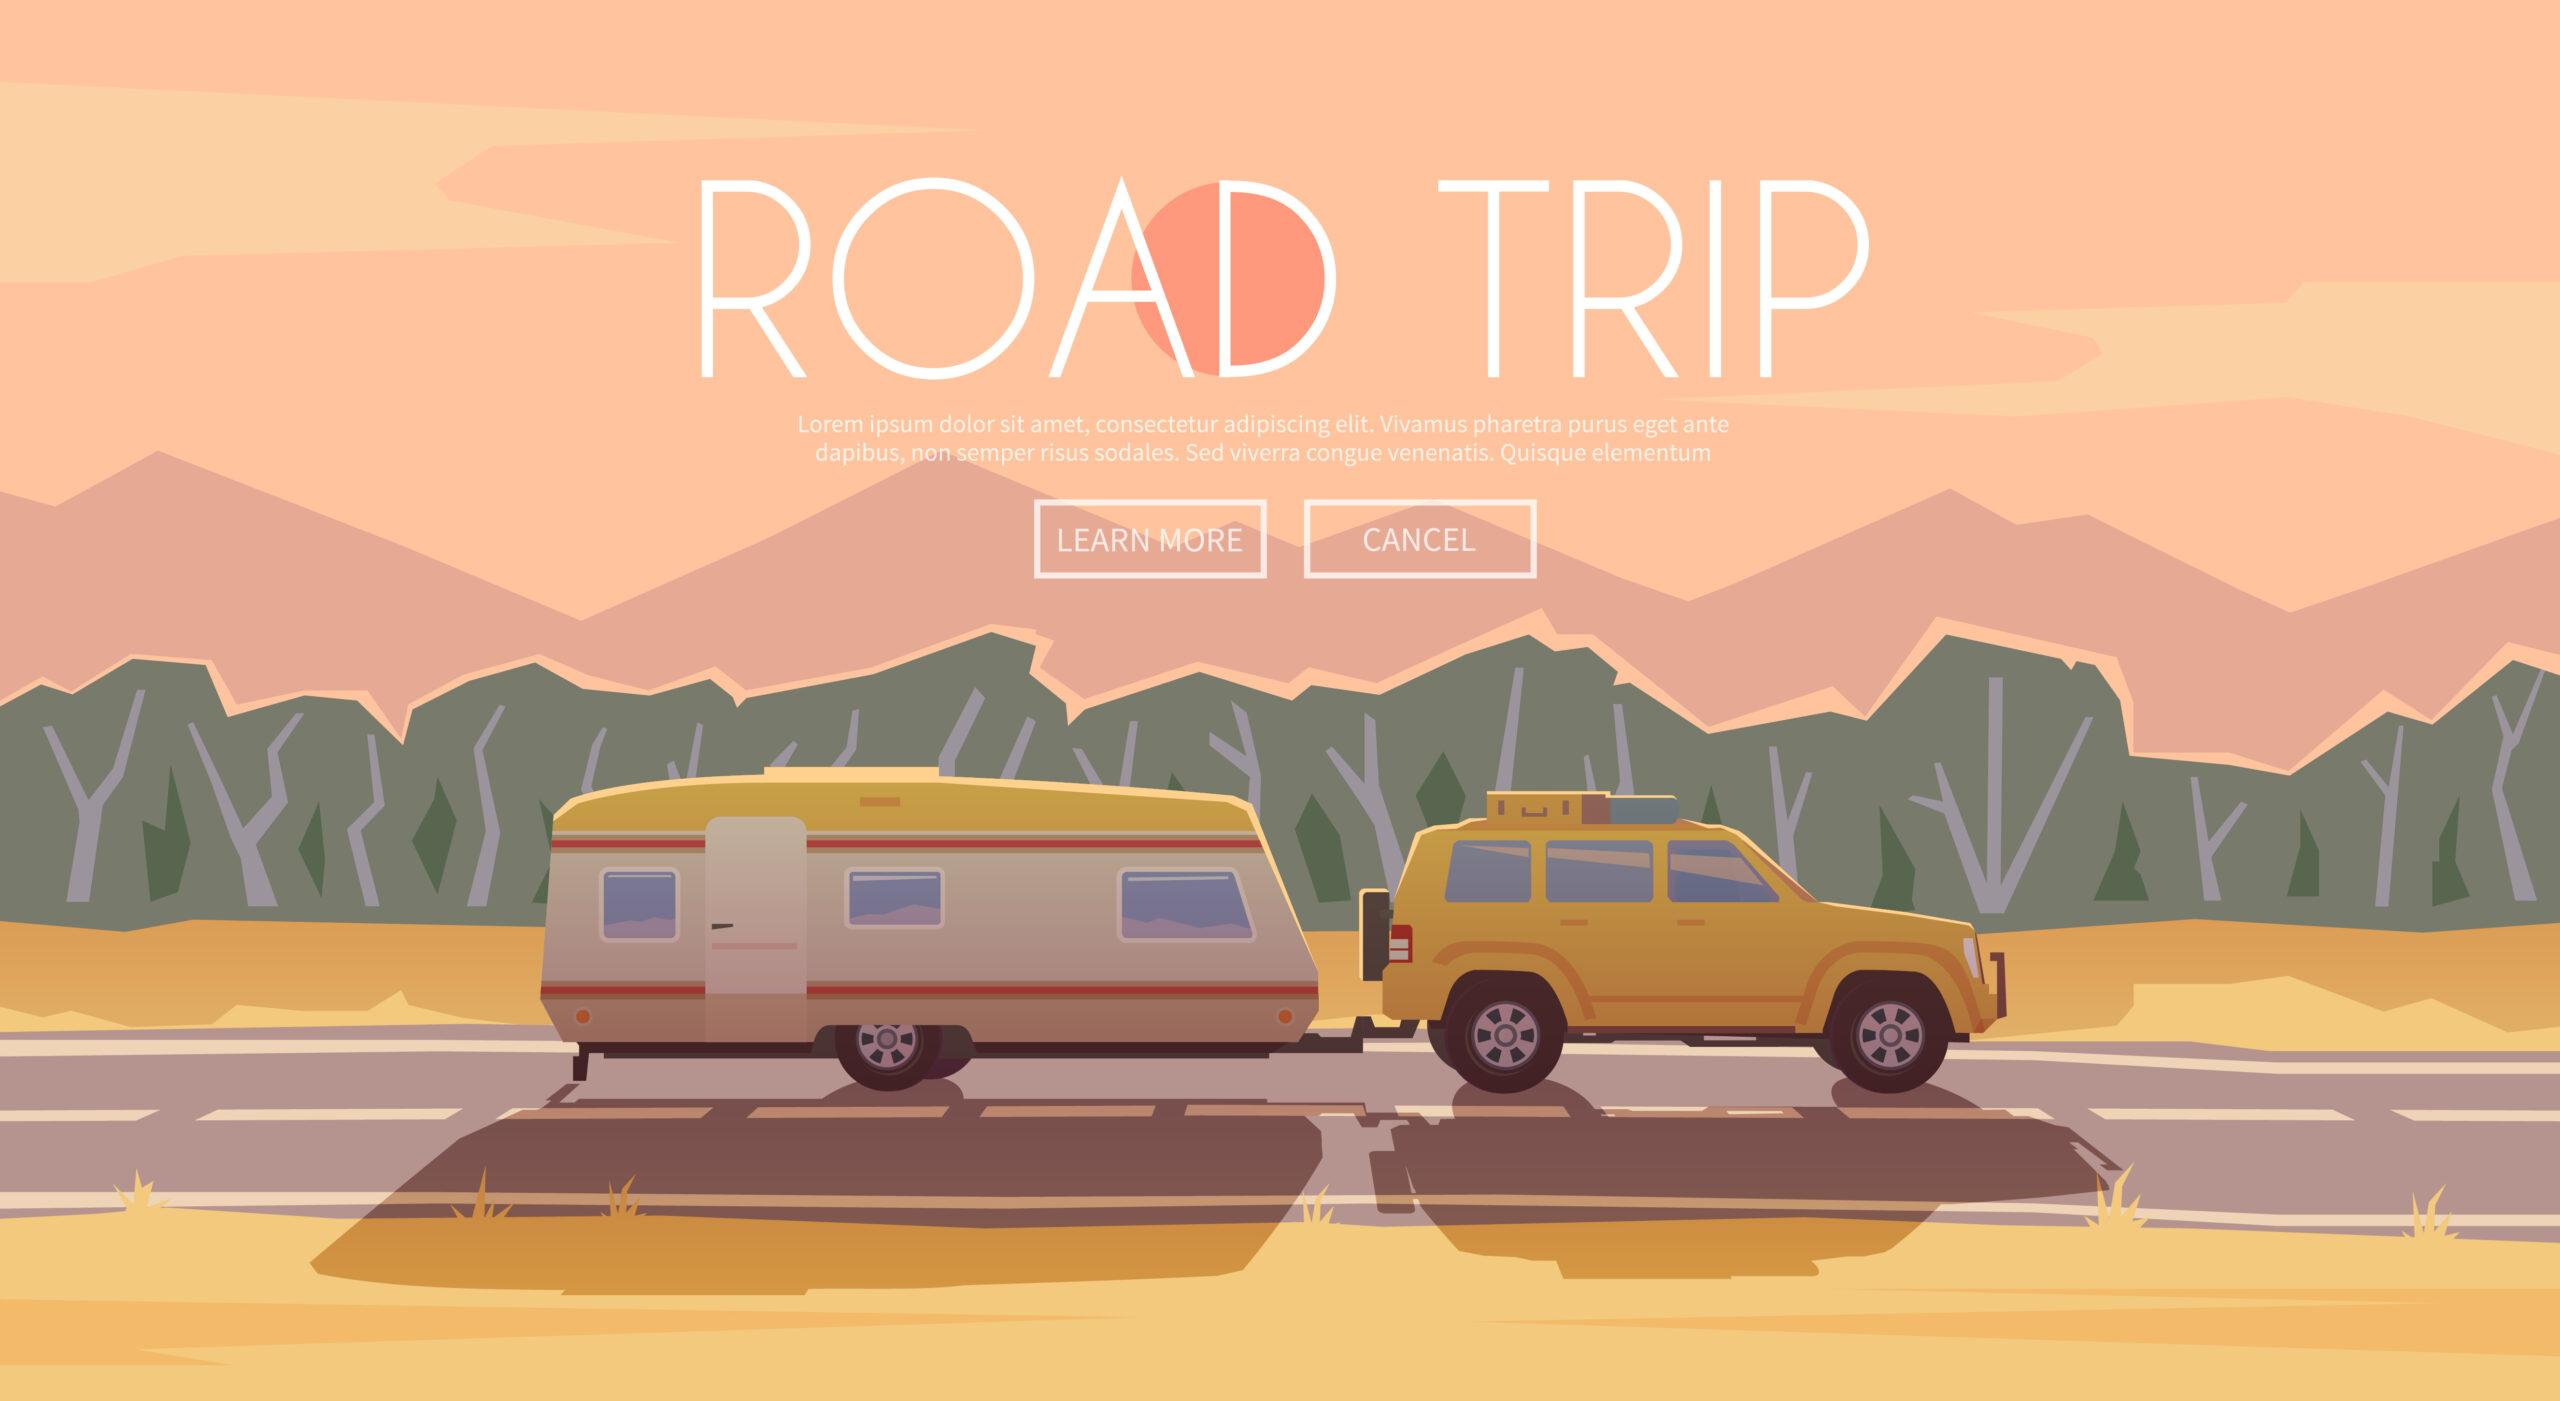 Auto Checklist, Auto Maintenance, Safe Vacation, Road Trip